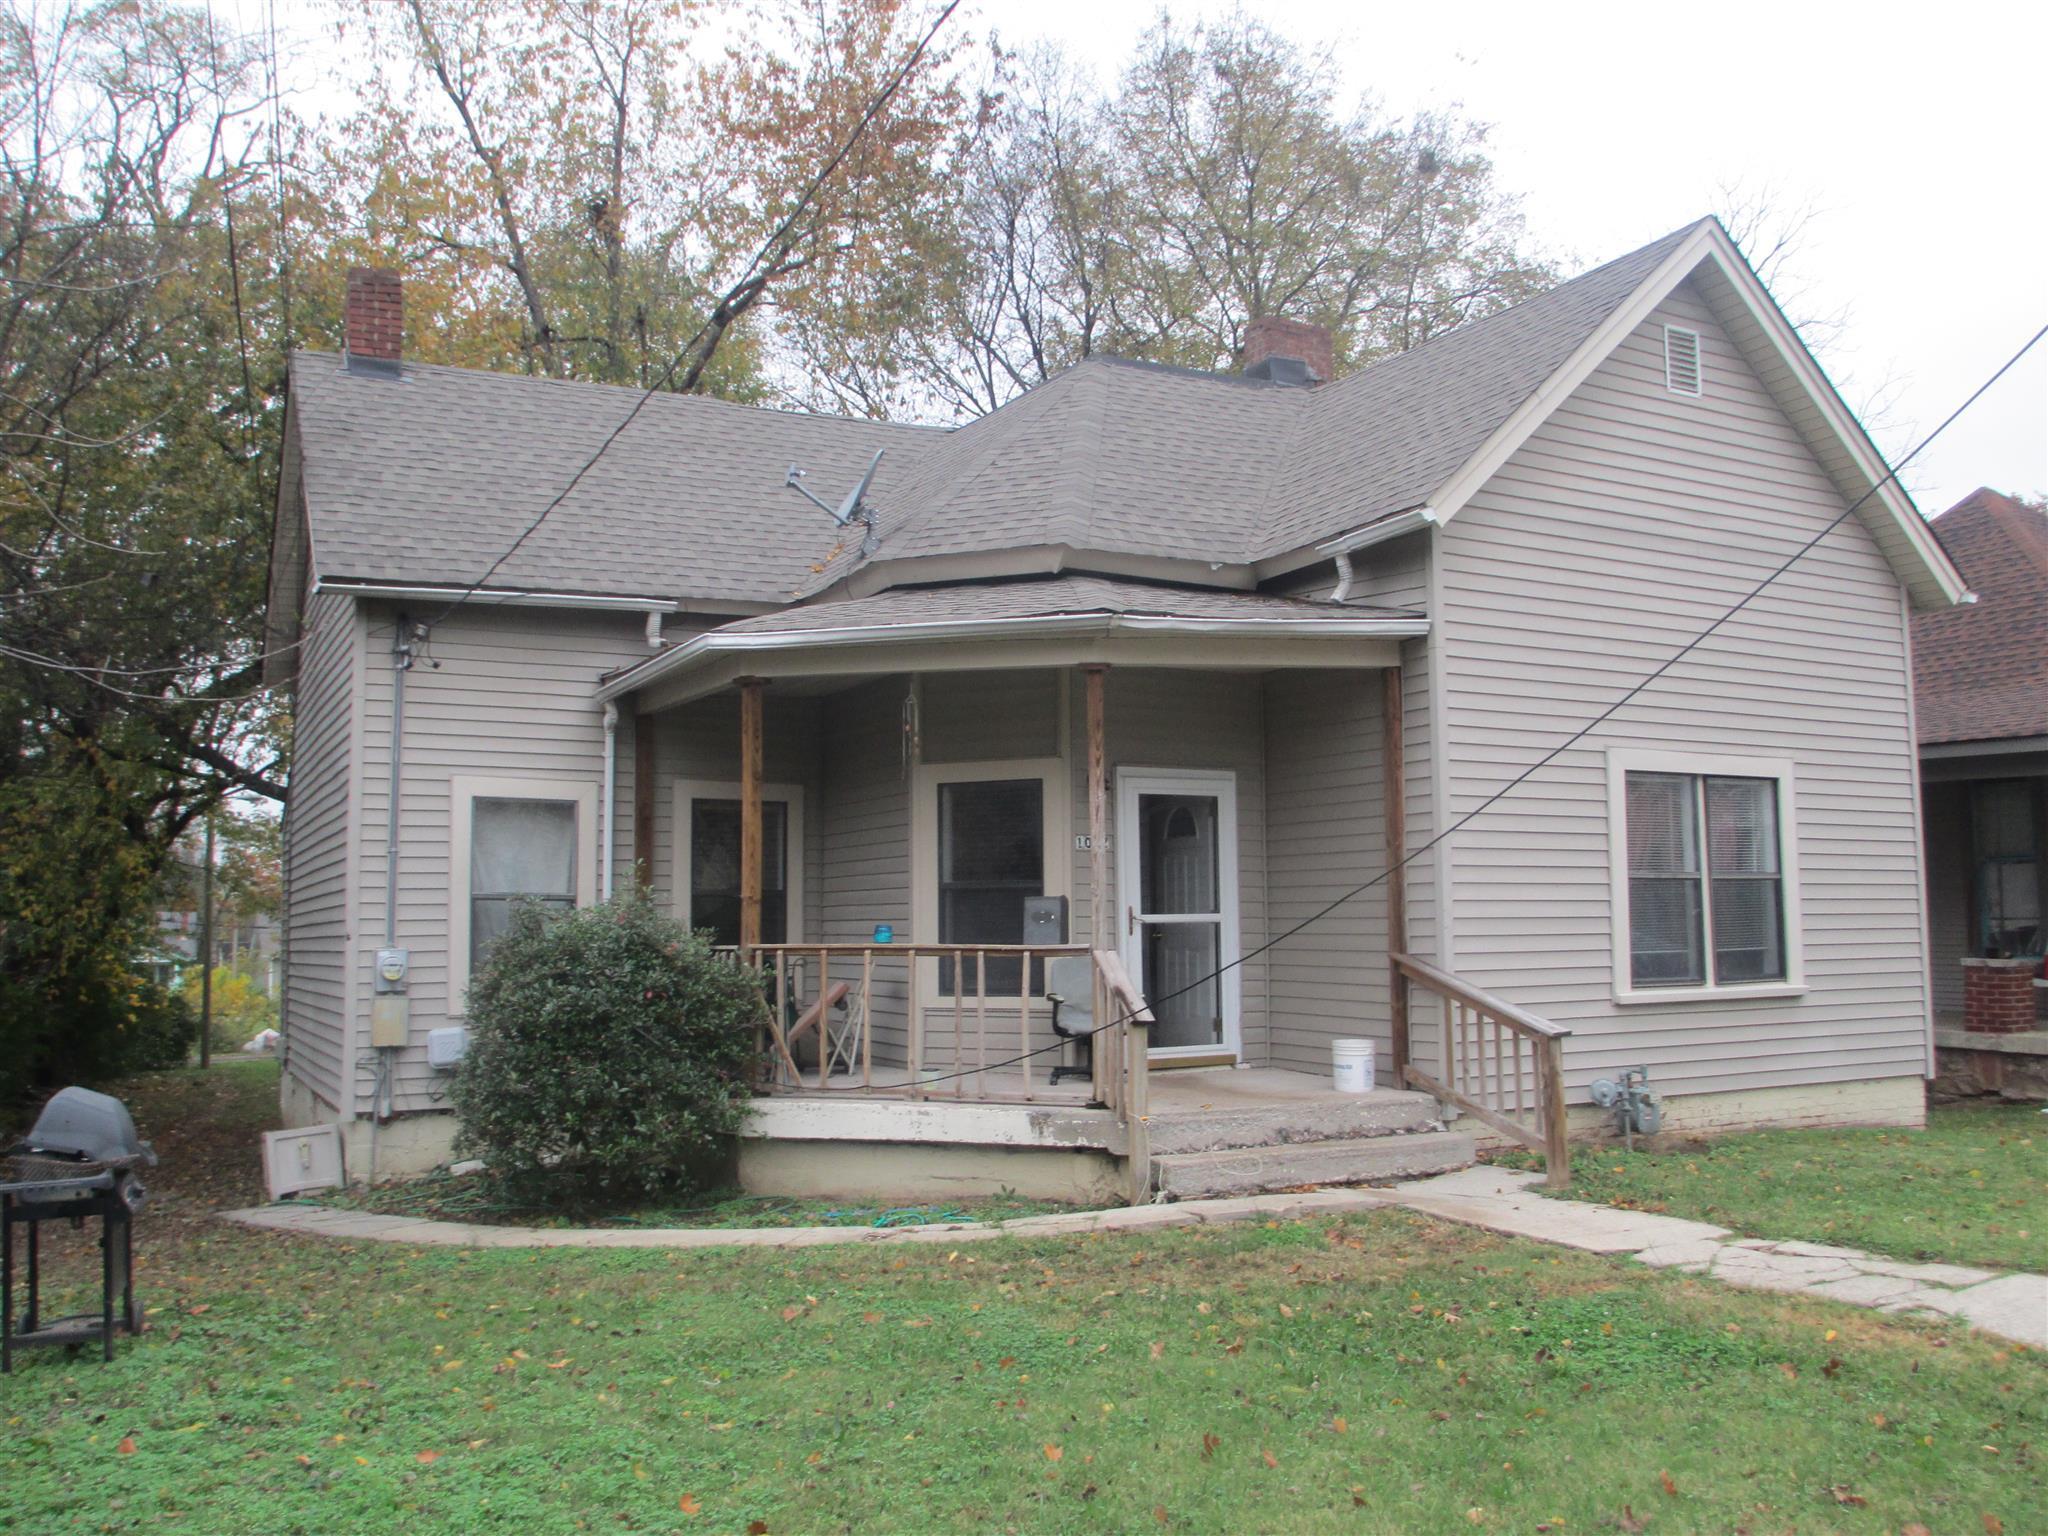 1002 N 5Th St, Nashville, TN 37207 - Nashville, TN real estate listing